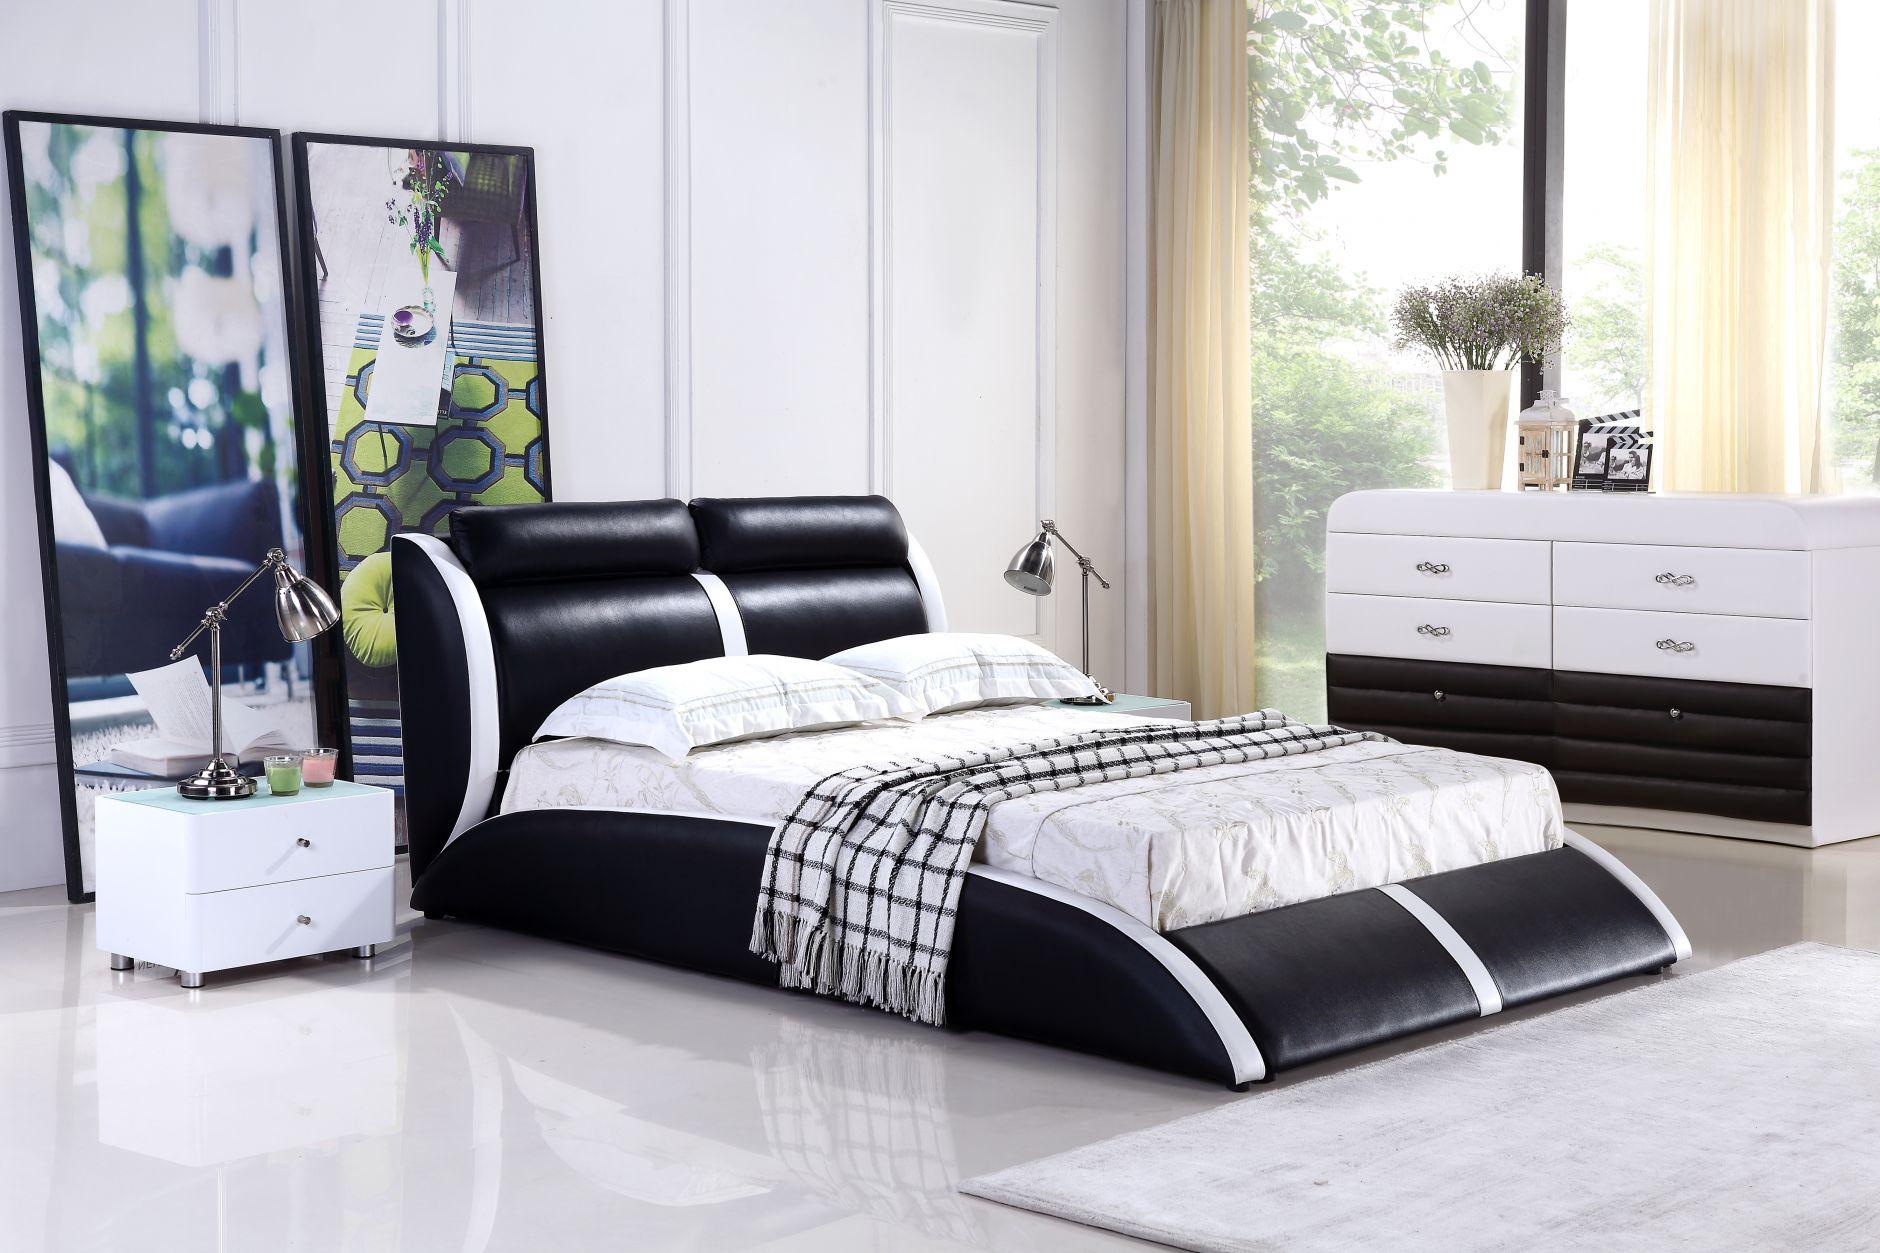 Free chambre coucher de cuir modle b with chambre a for Chambre a coucher pas chere